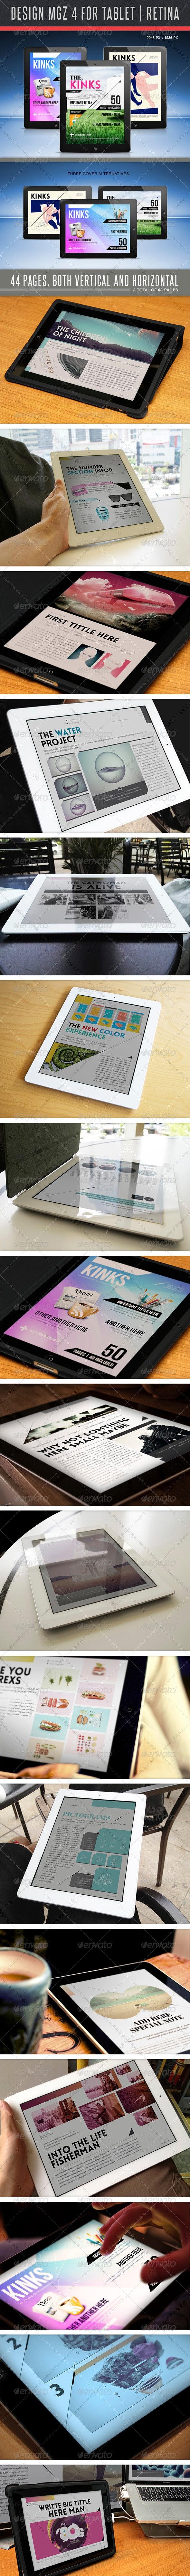 Design MGZ 4 For Tablet - Digital Magazines ePublishing